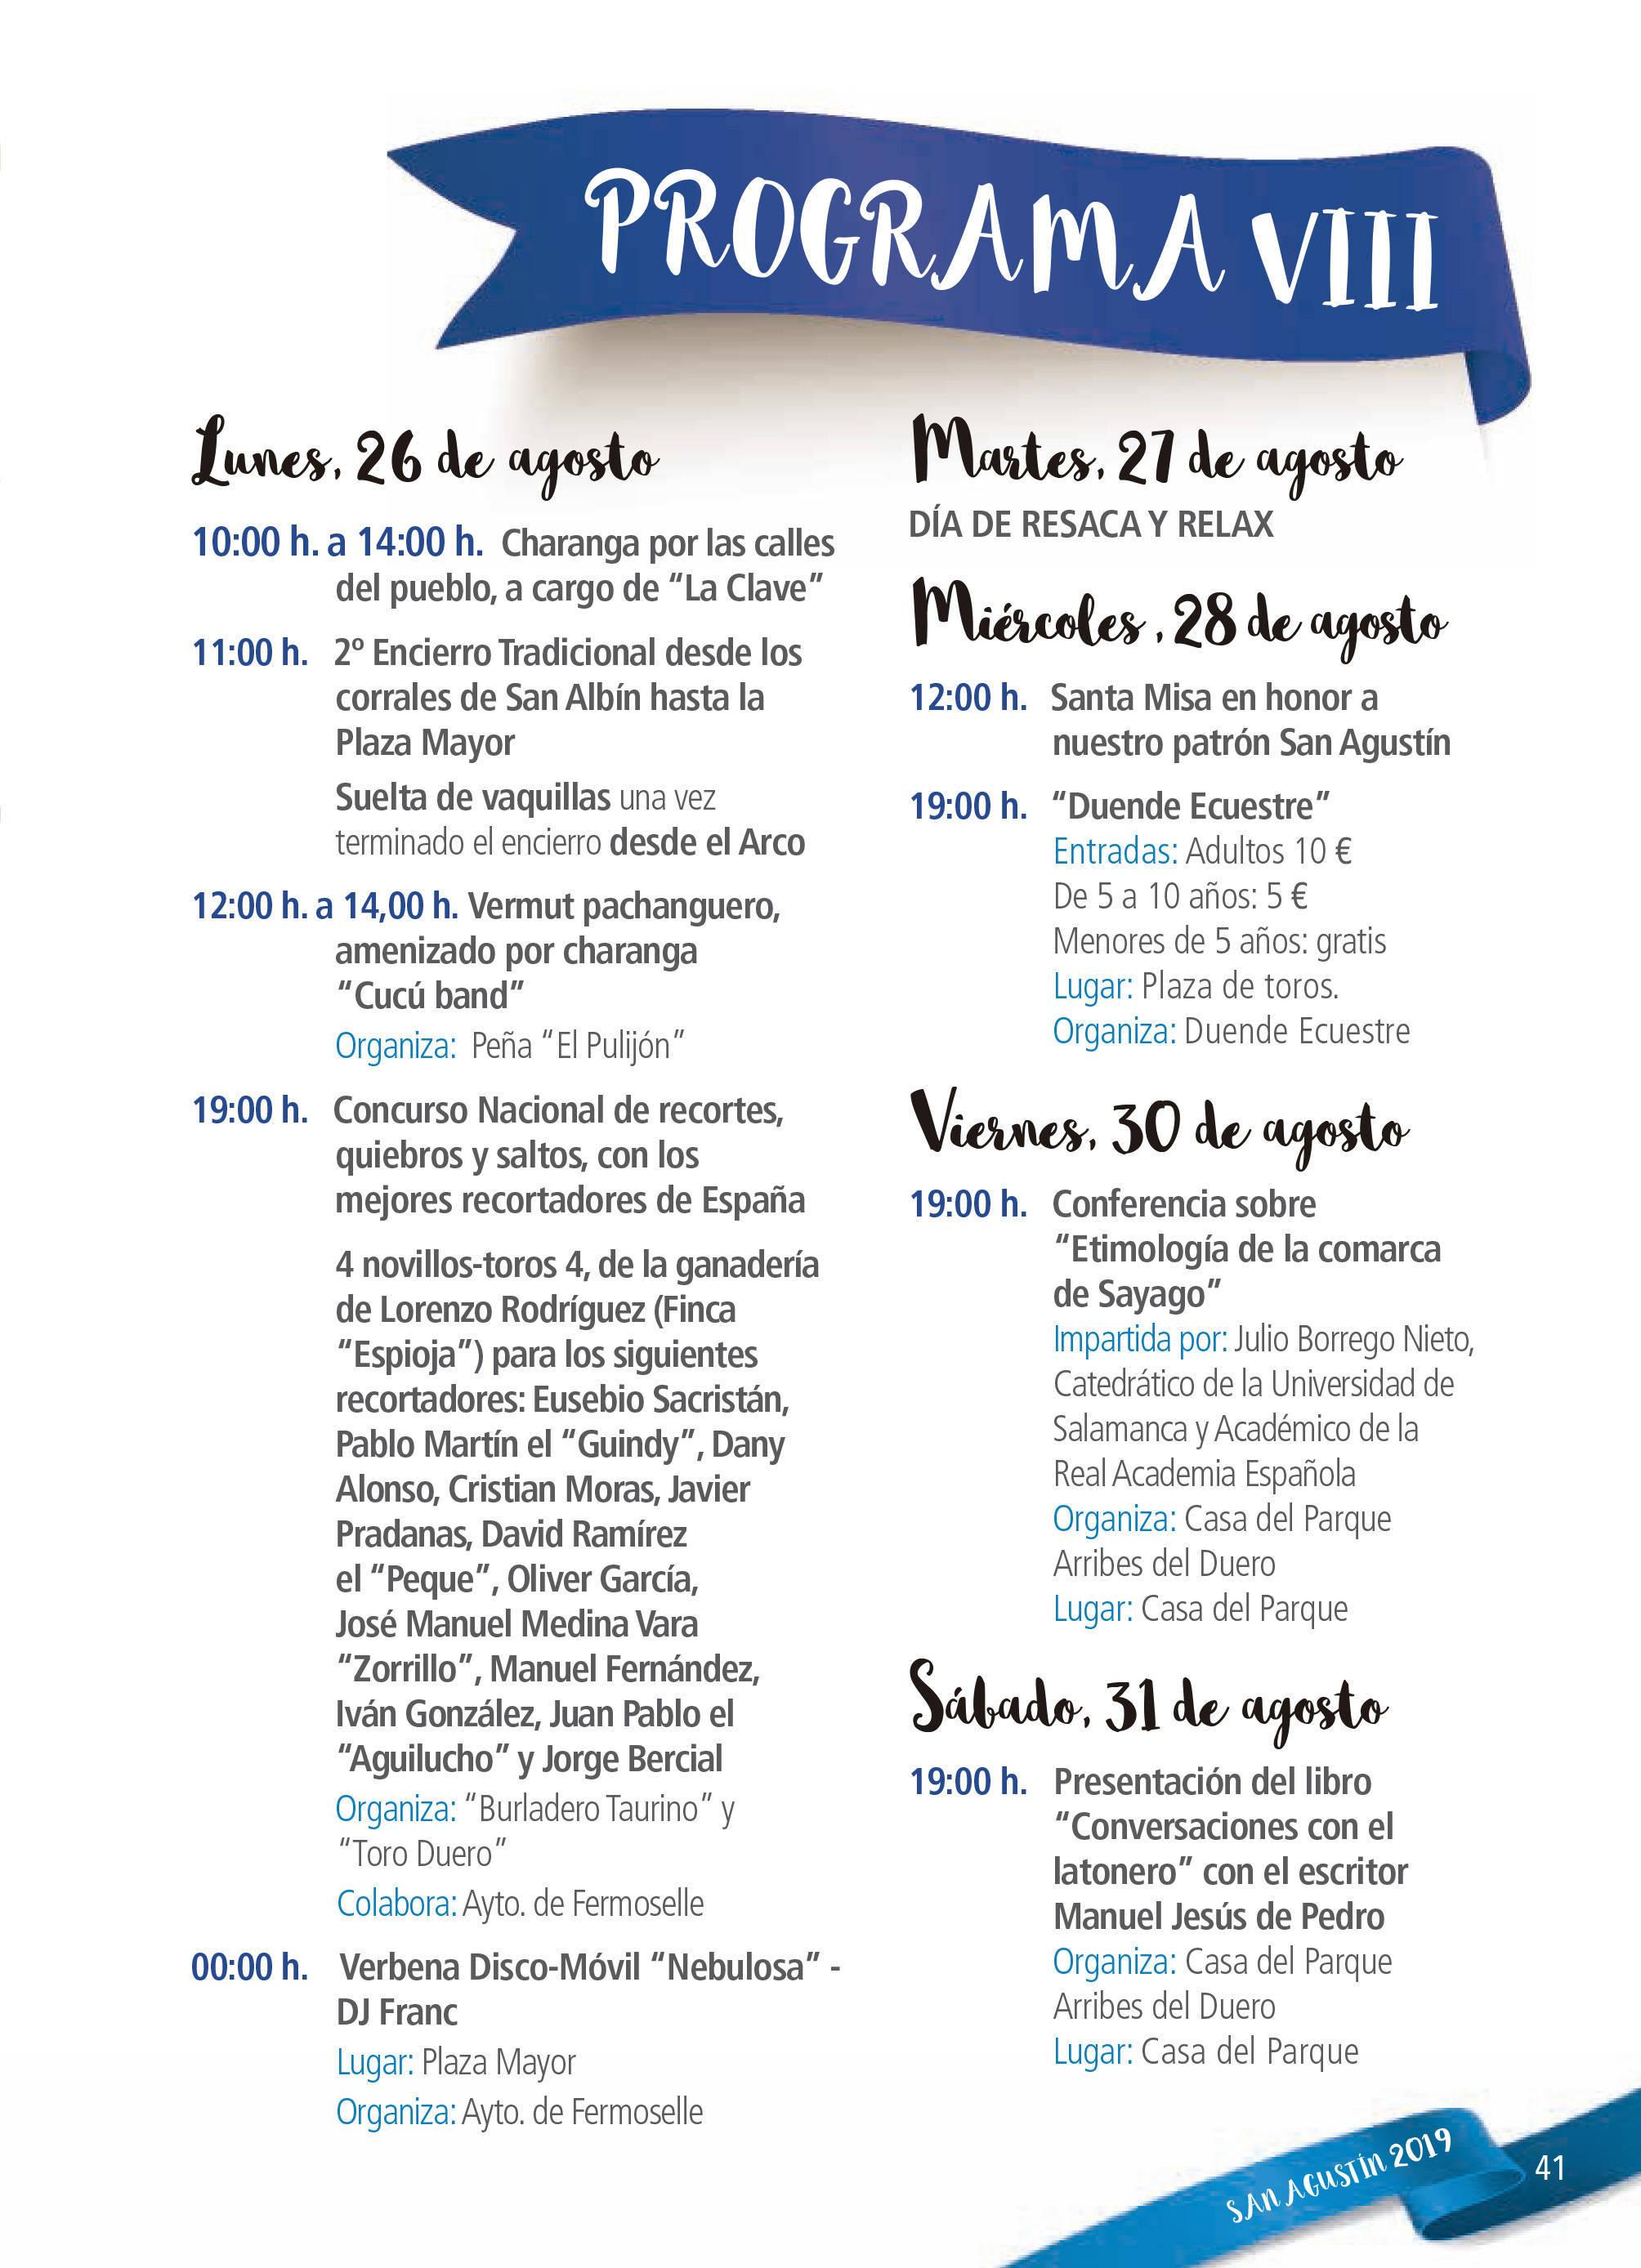 Programa de ferias y fiestas 2019 - Fermoselle (Zamora) 15